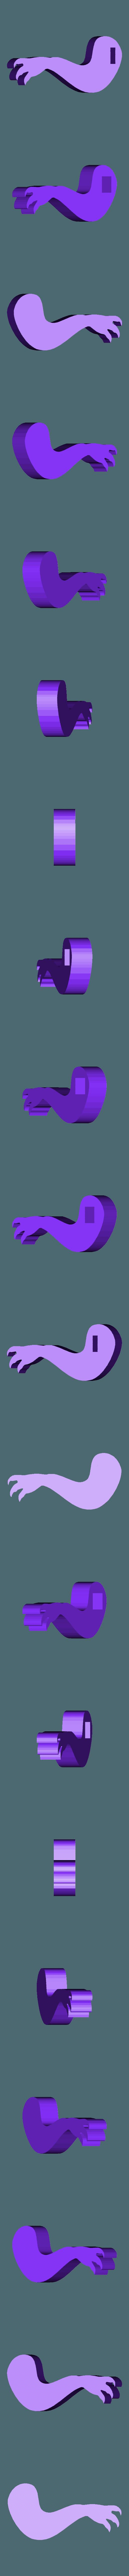 5_Godzilla_RIGHT_Arm_v2.stl Download free STL file Flexi Godzilla • 3D printable object, dancingchicken